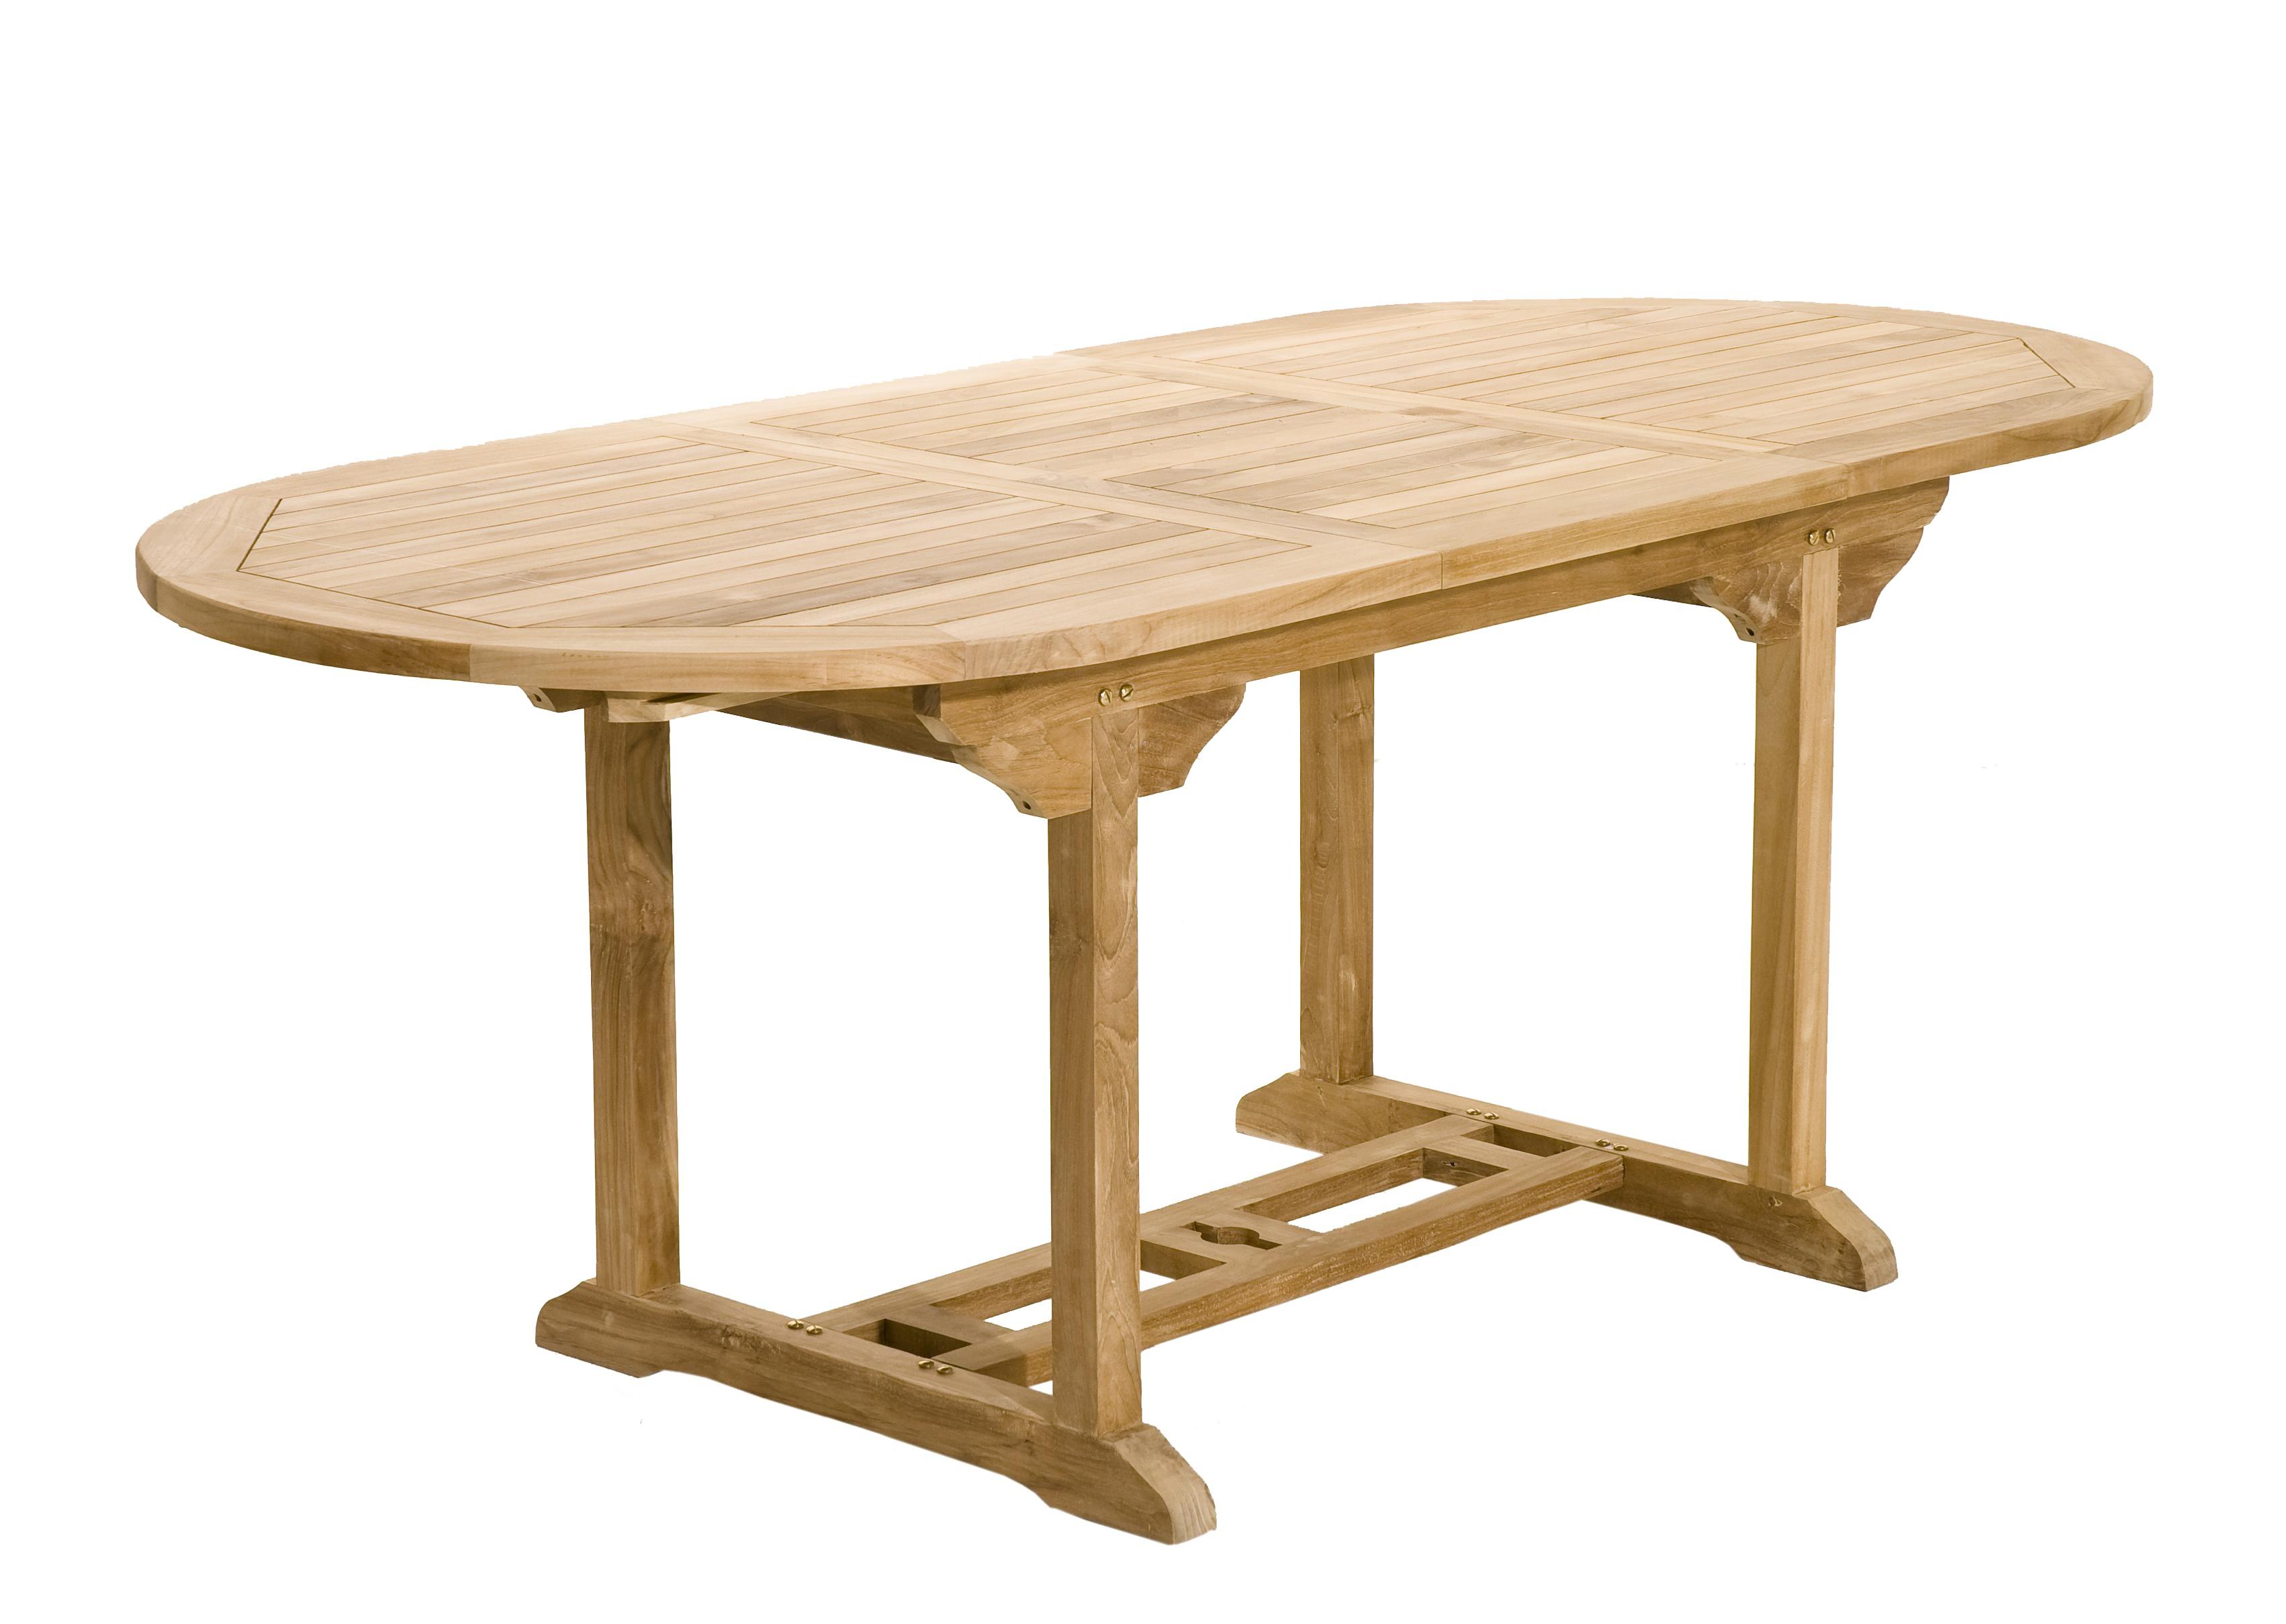 Salon jardin Teck table ovale 150/200cm 4 chaises 2 faut. SUMMER